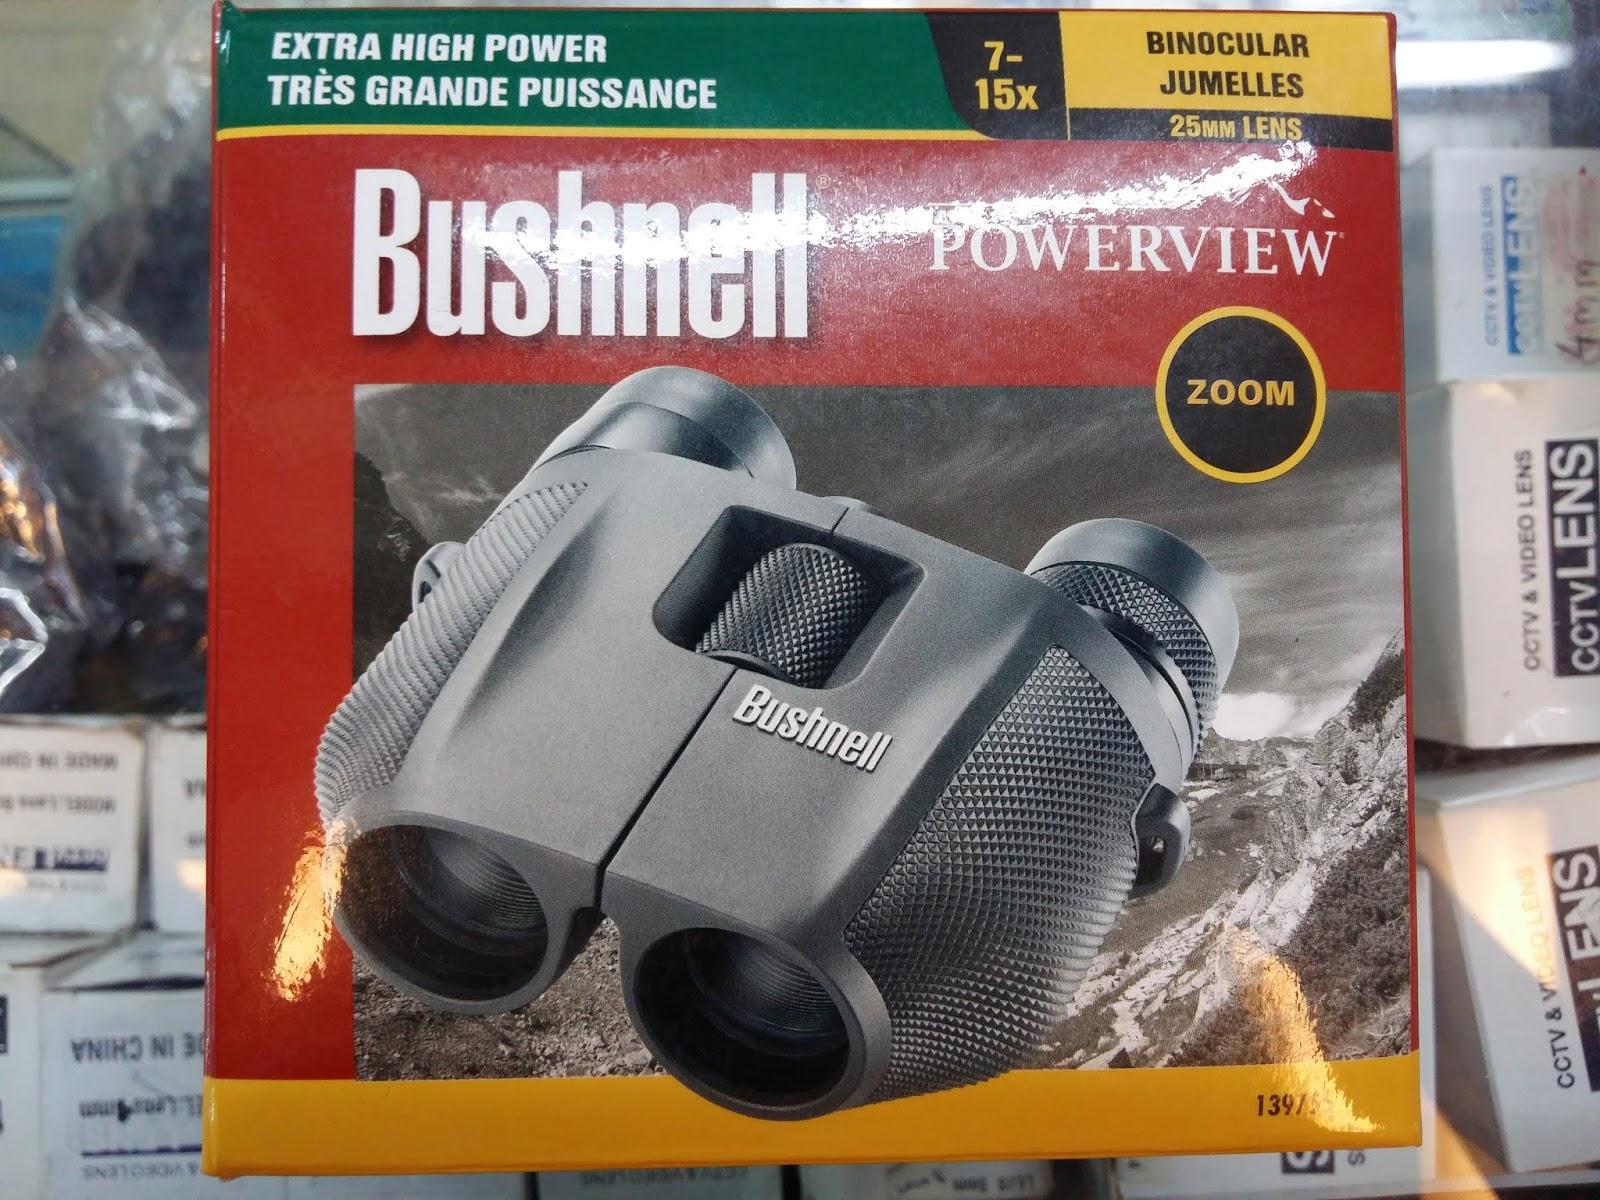 Fluke 772 Milliamp Clamp Meter My Product Smart Sensor Ar861 Laser Distance 60m Bushnell Binocular Powerview 7 15x25mm